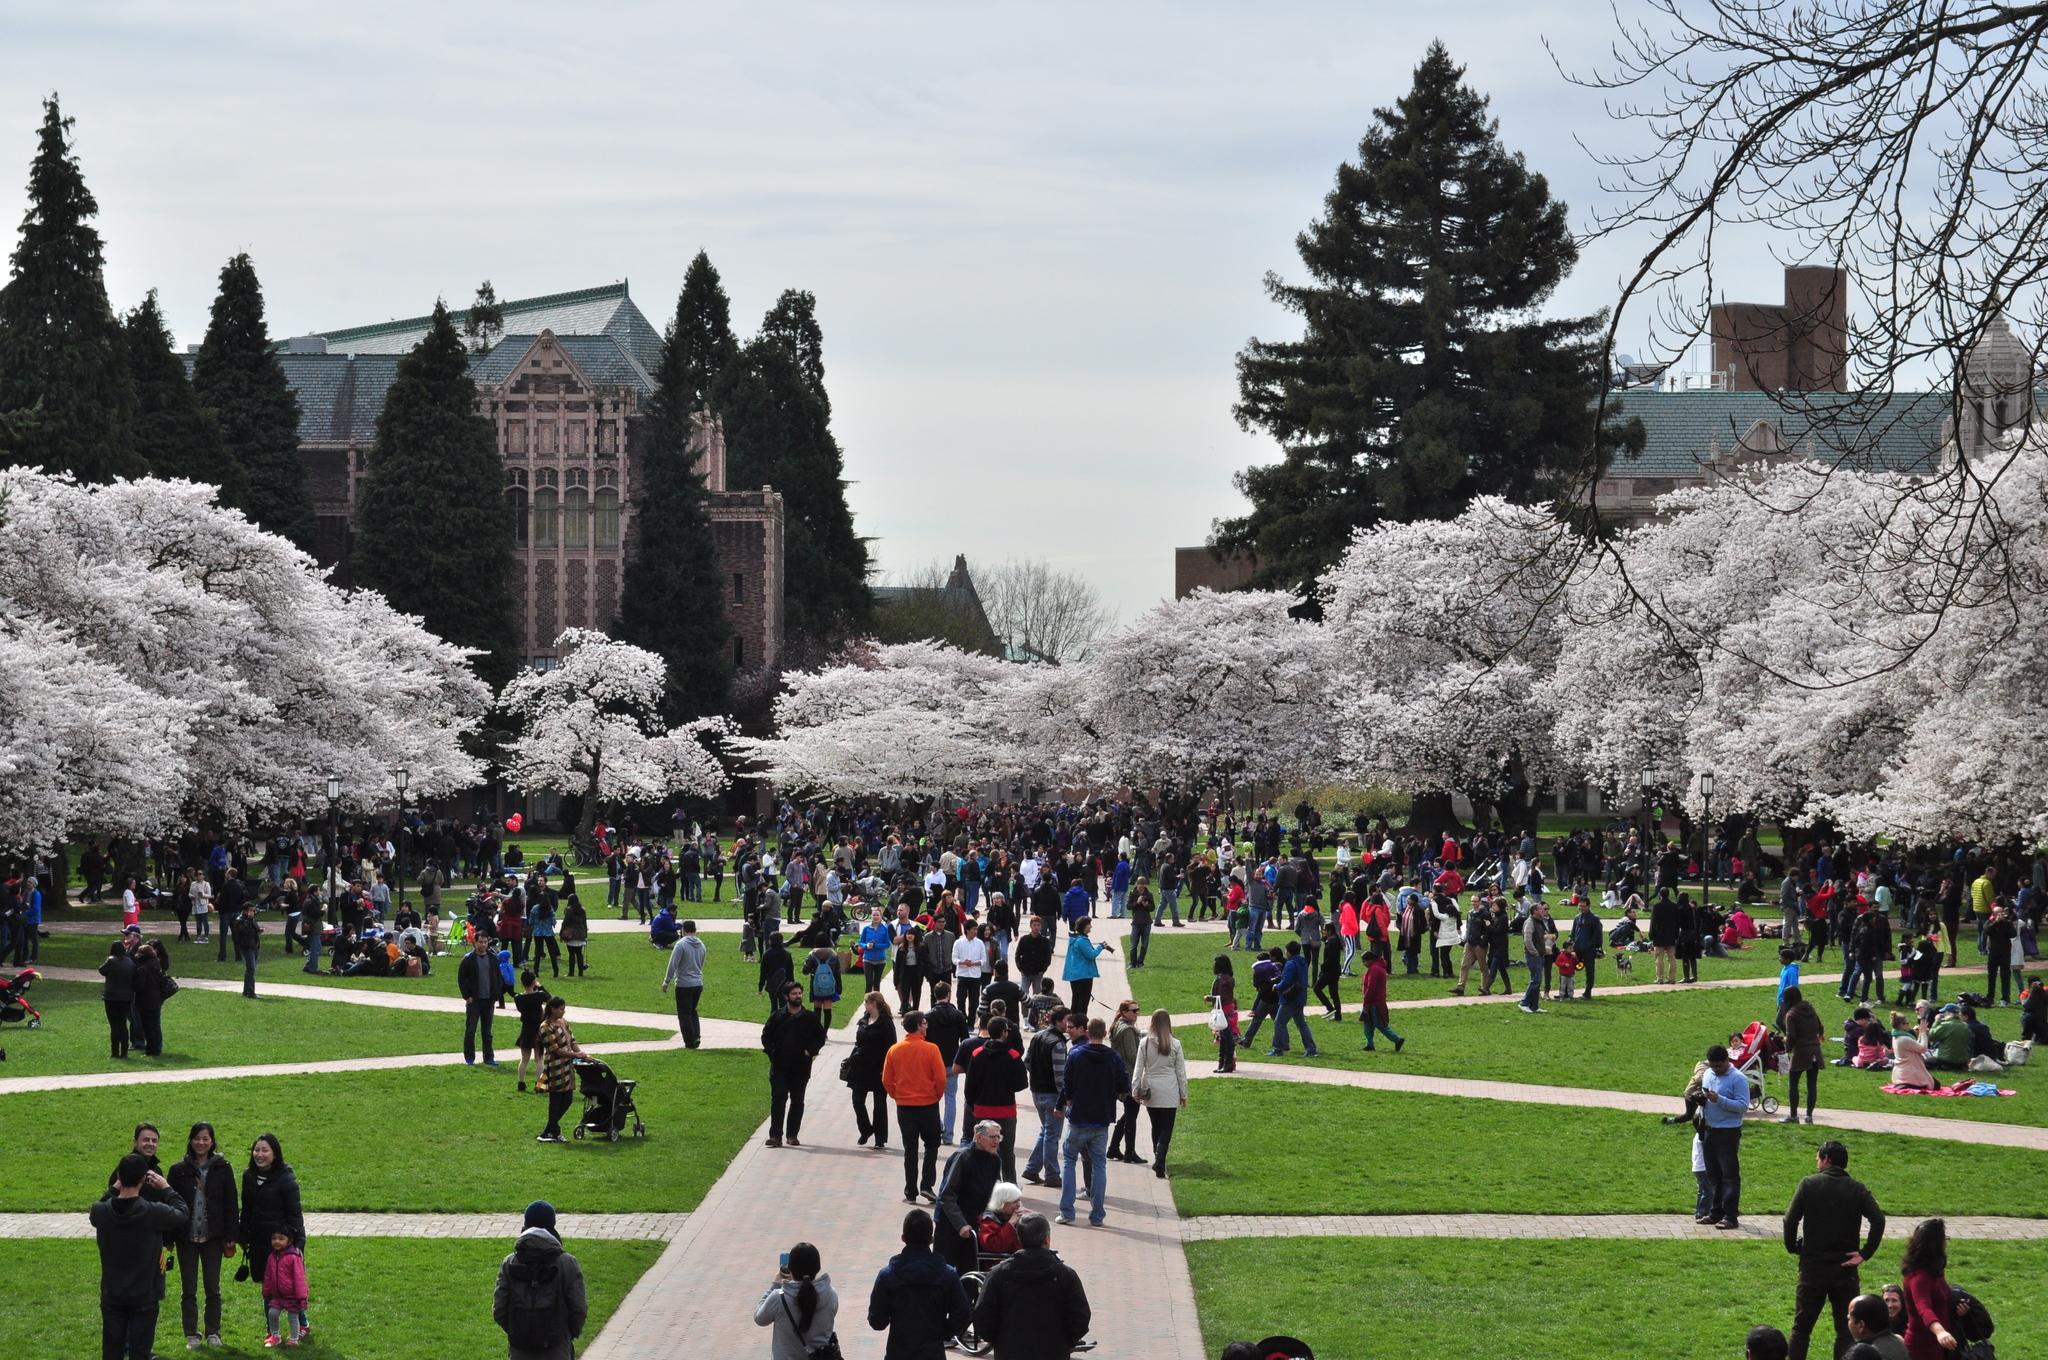 Tutoring Services at the University of Washington